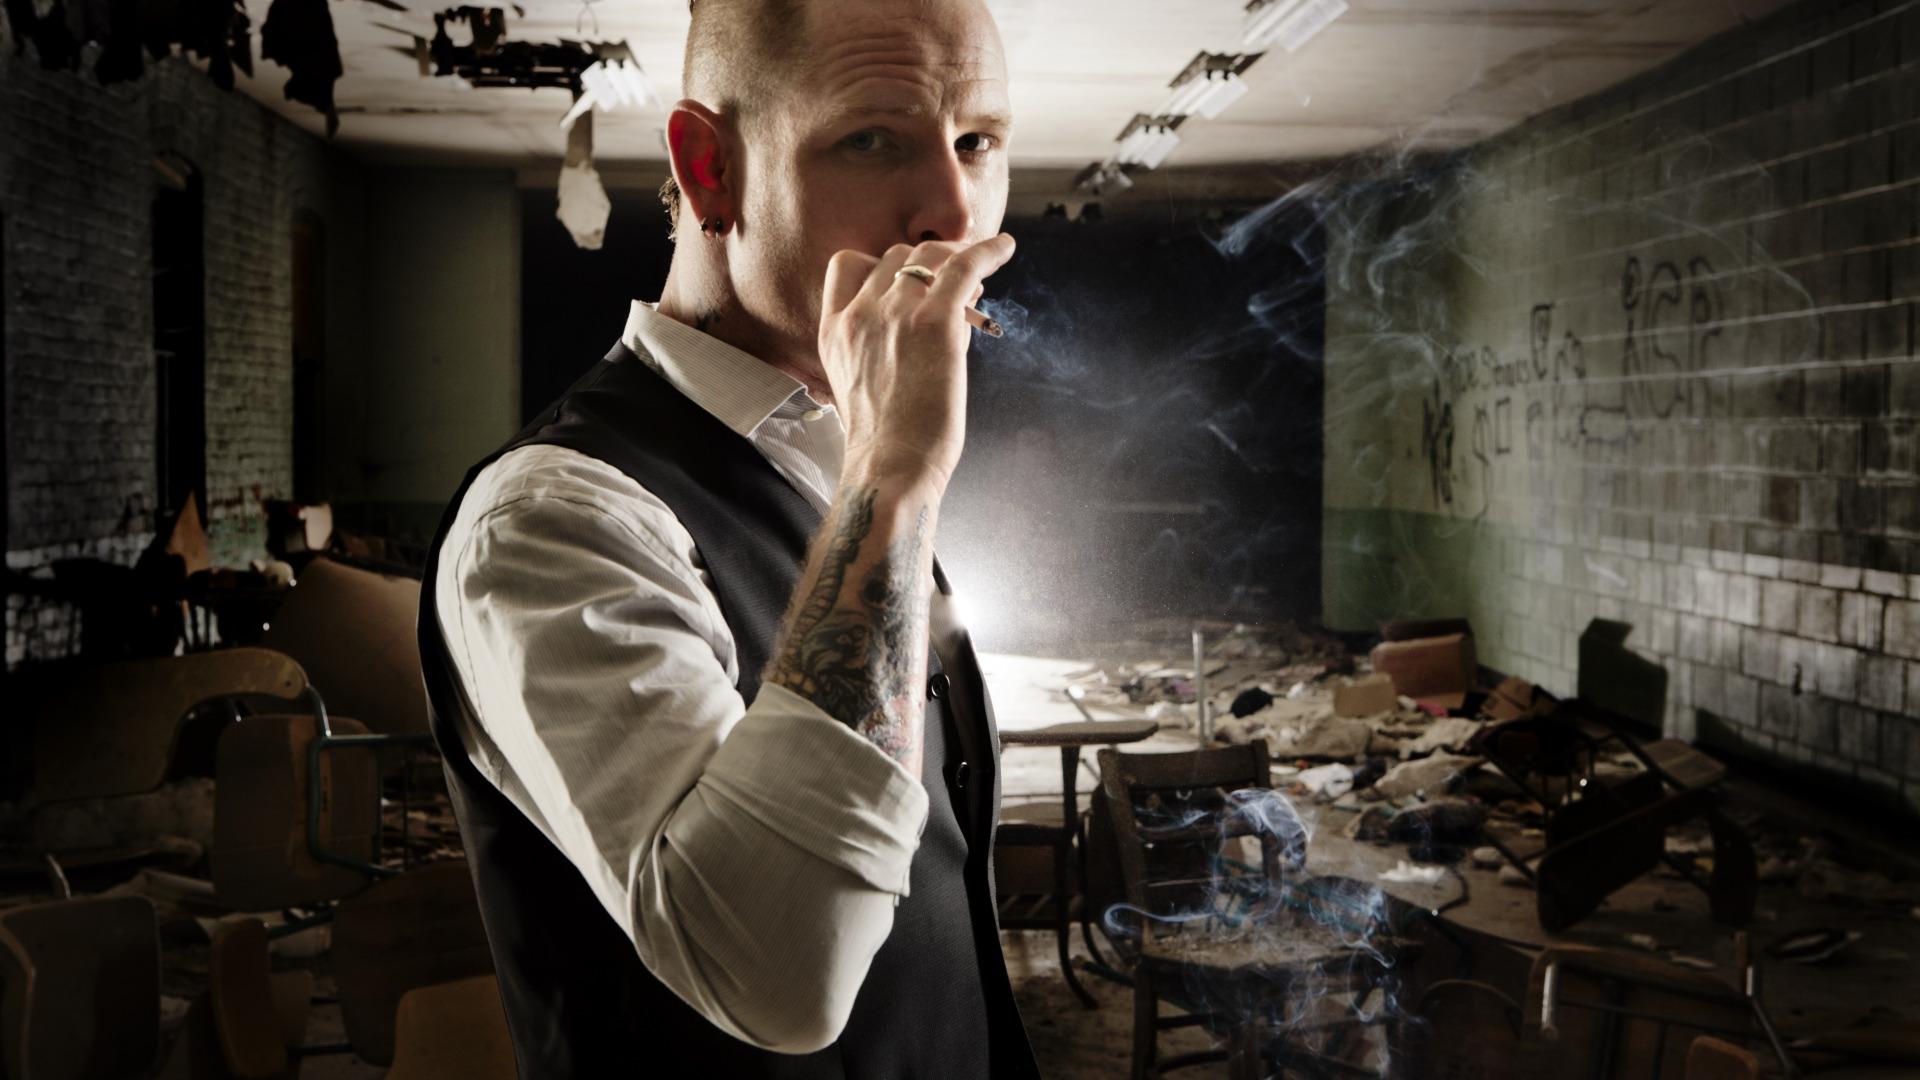 Download Wallpaper Tattoo Cigarette Male Metal Mohawk